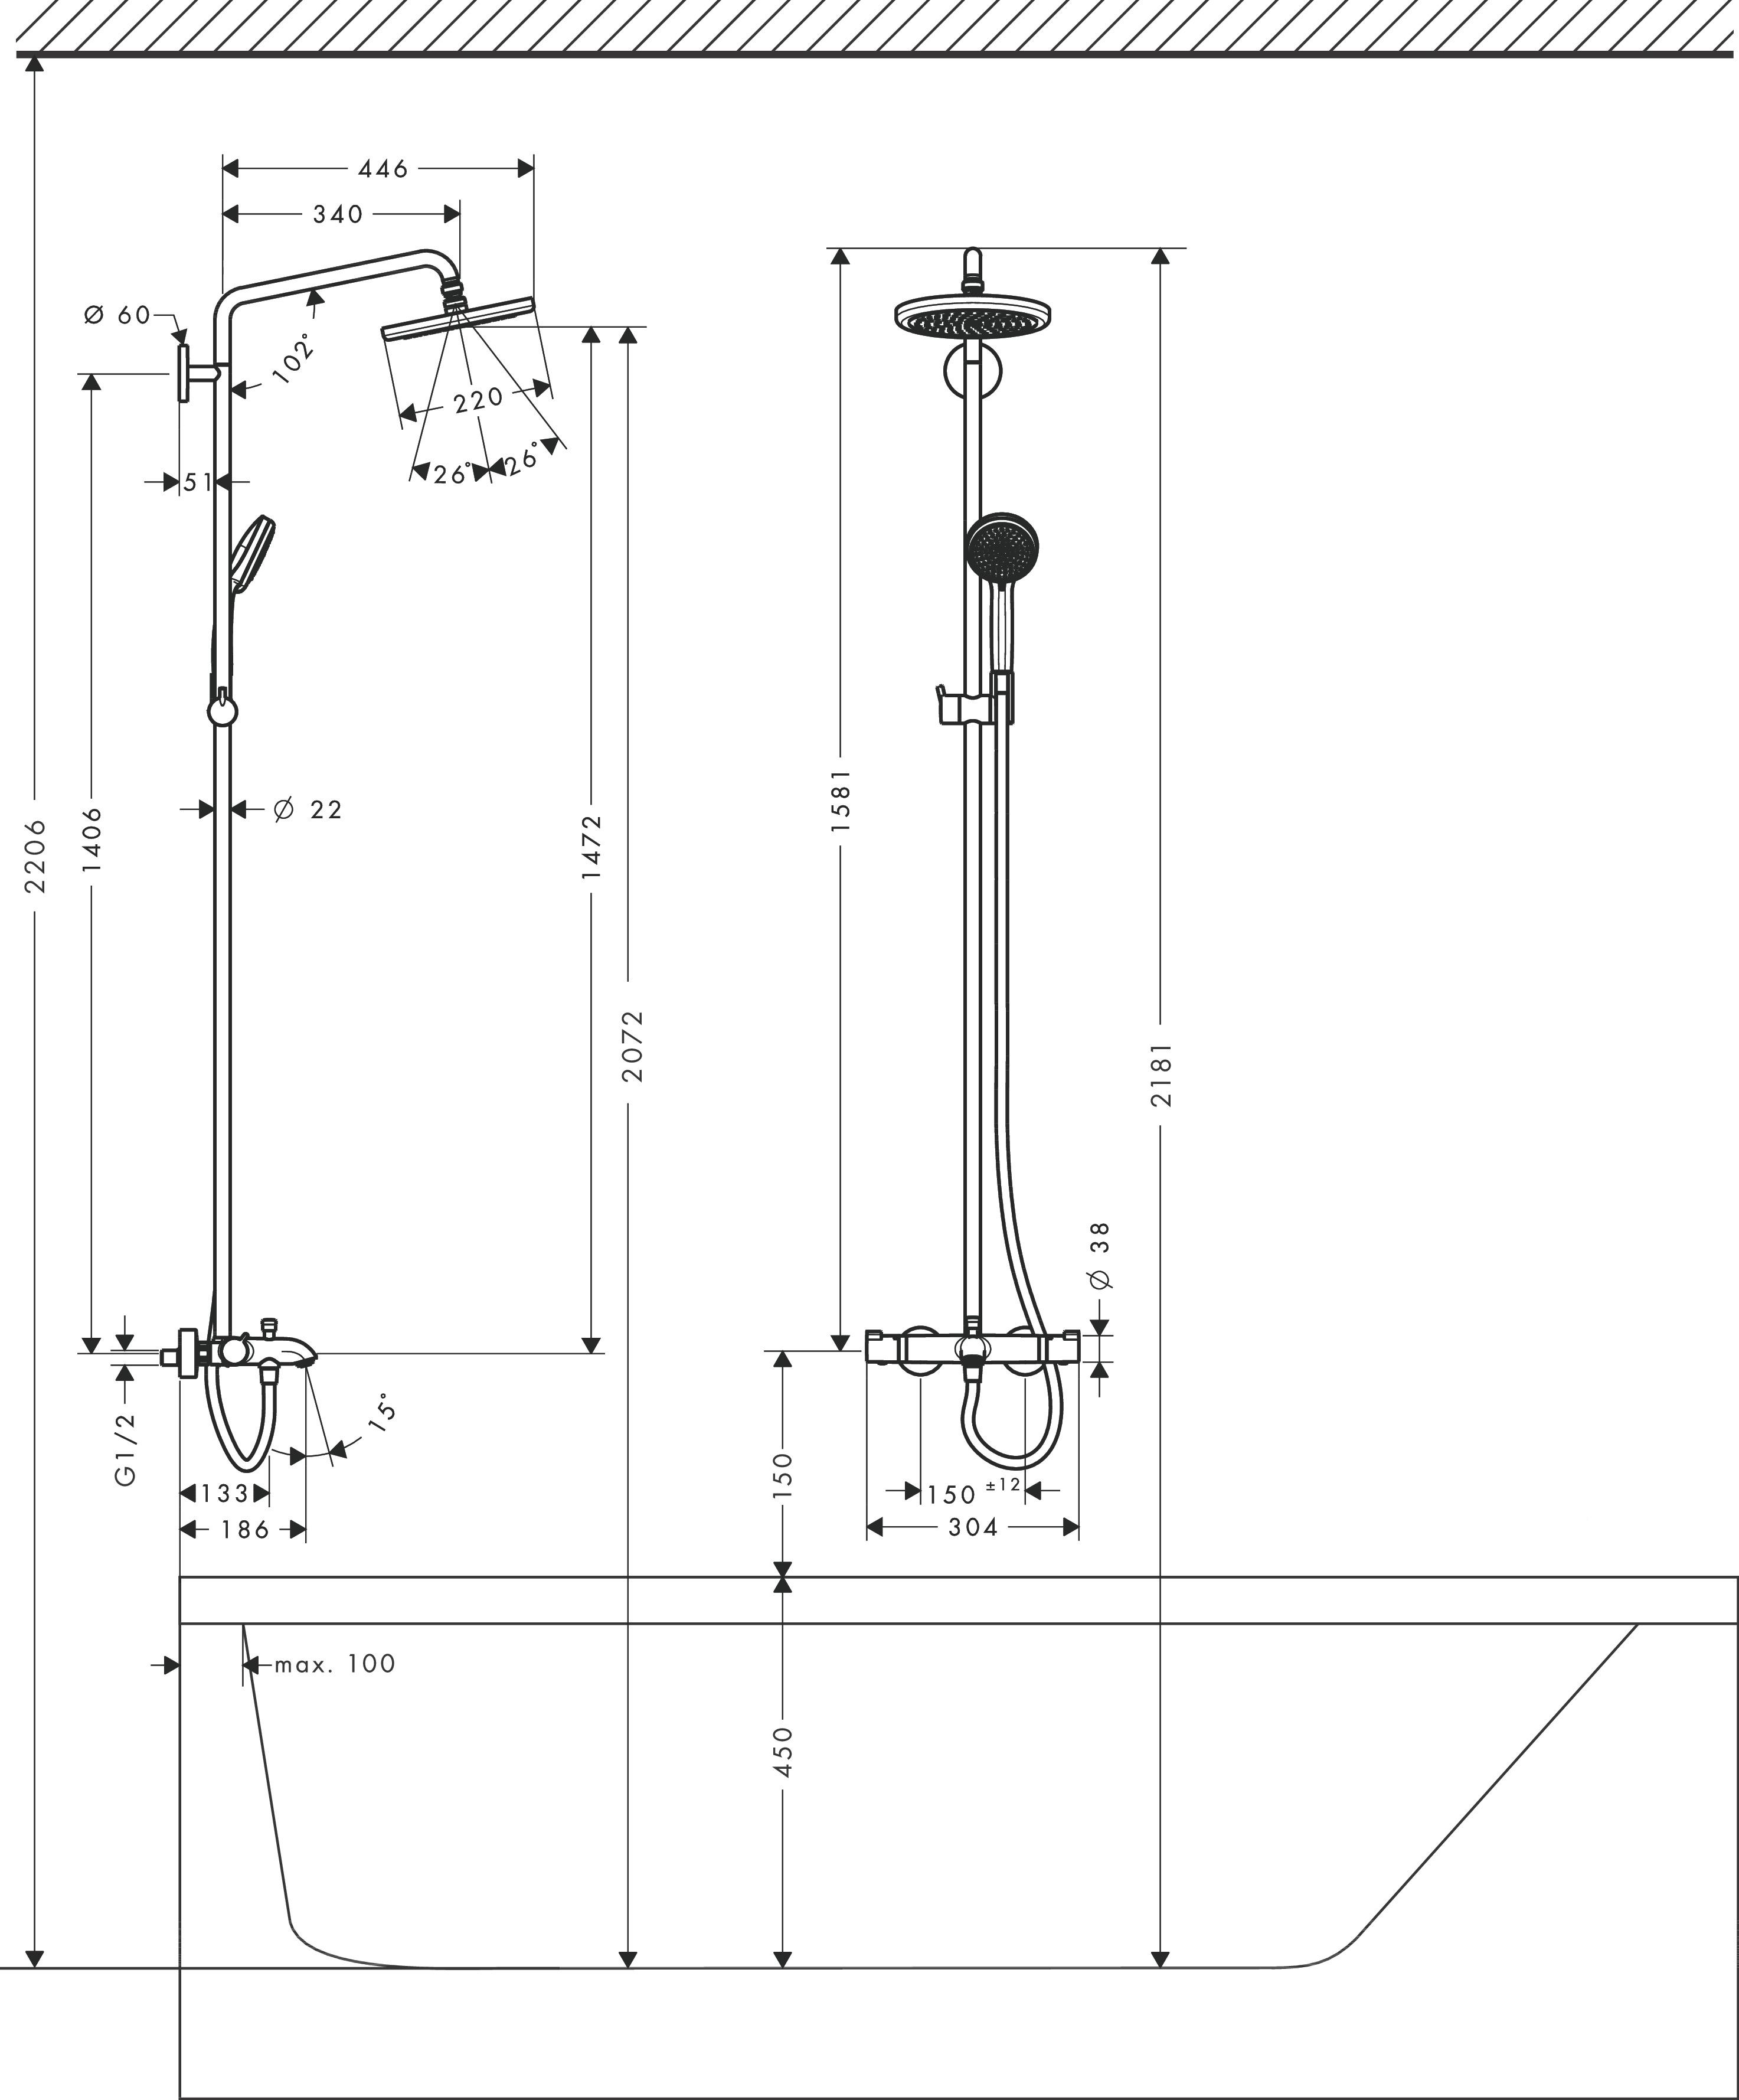 hansgrohe showerpipes croma 1 strahlart art nr 27223000 hansgrohe de. Black Bedroom Furniture Sets. Home Design Ideas